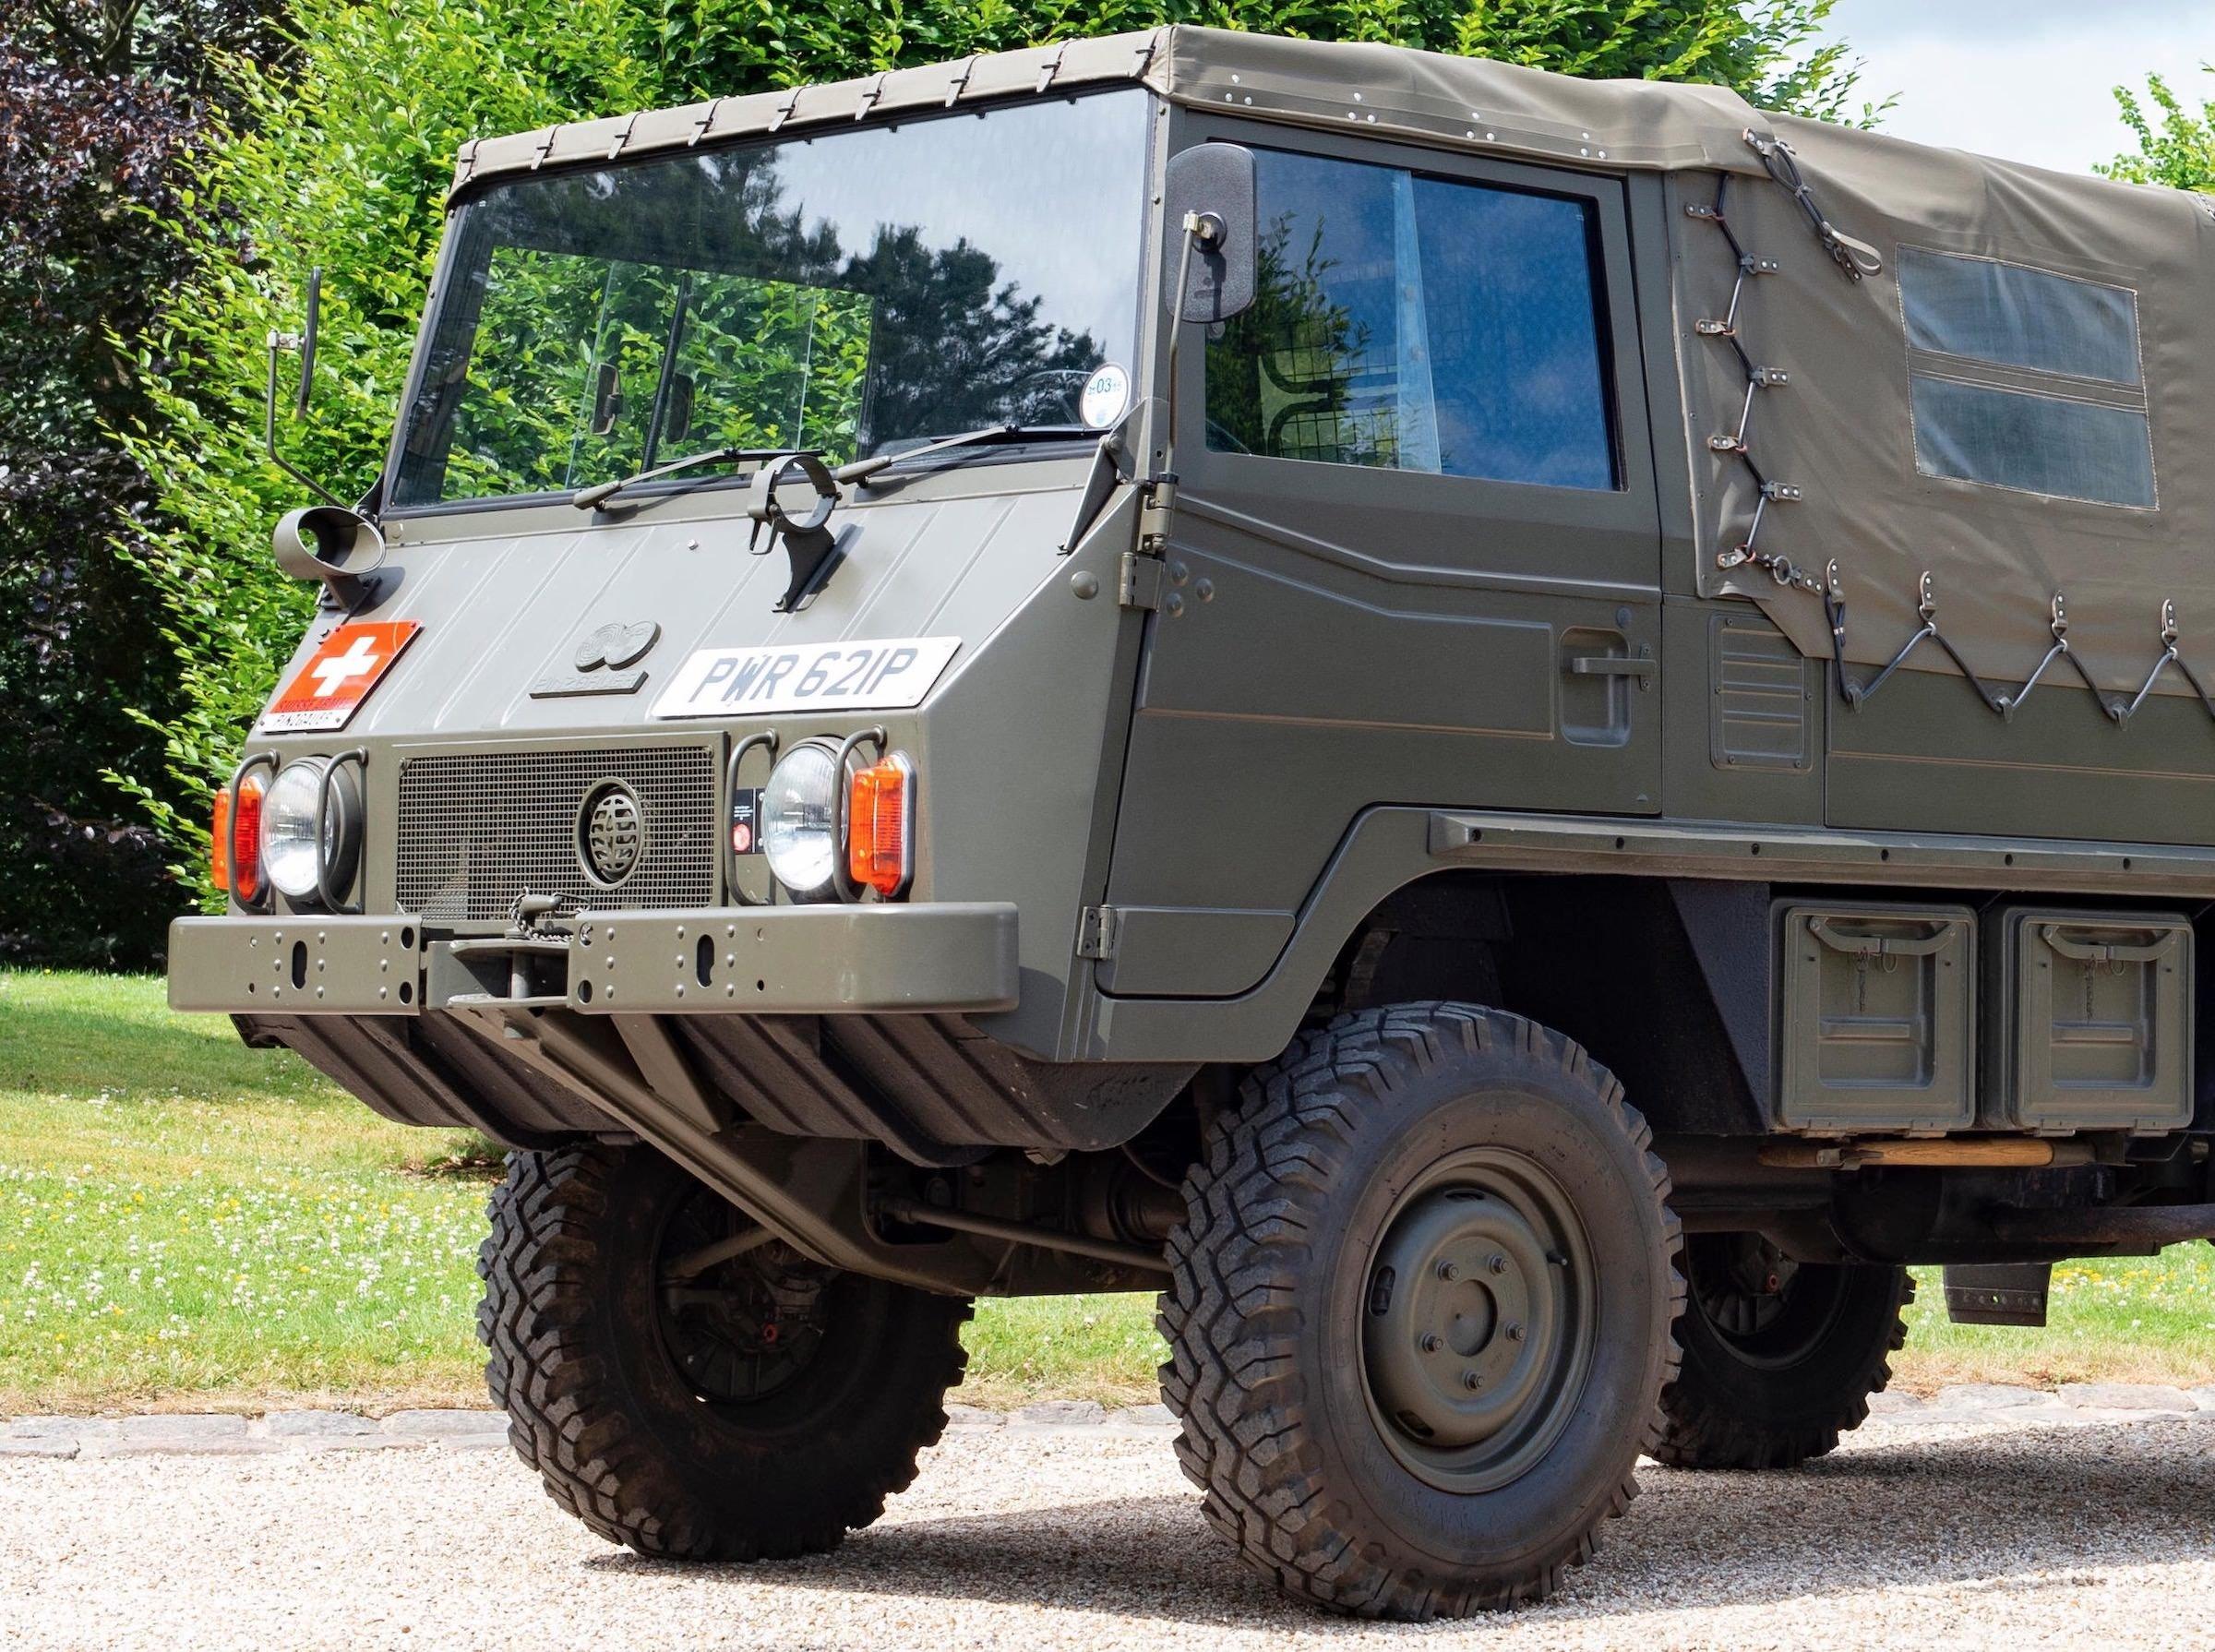 Steyr-Daimler-Puch Pinzgauer 4x4 Front